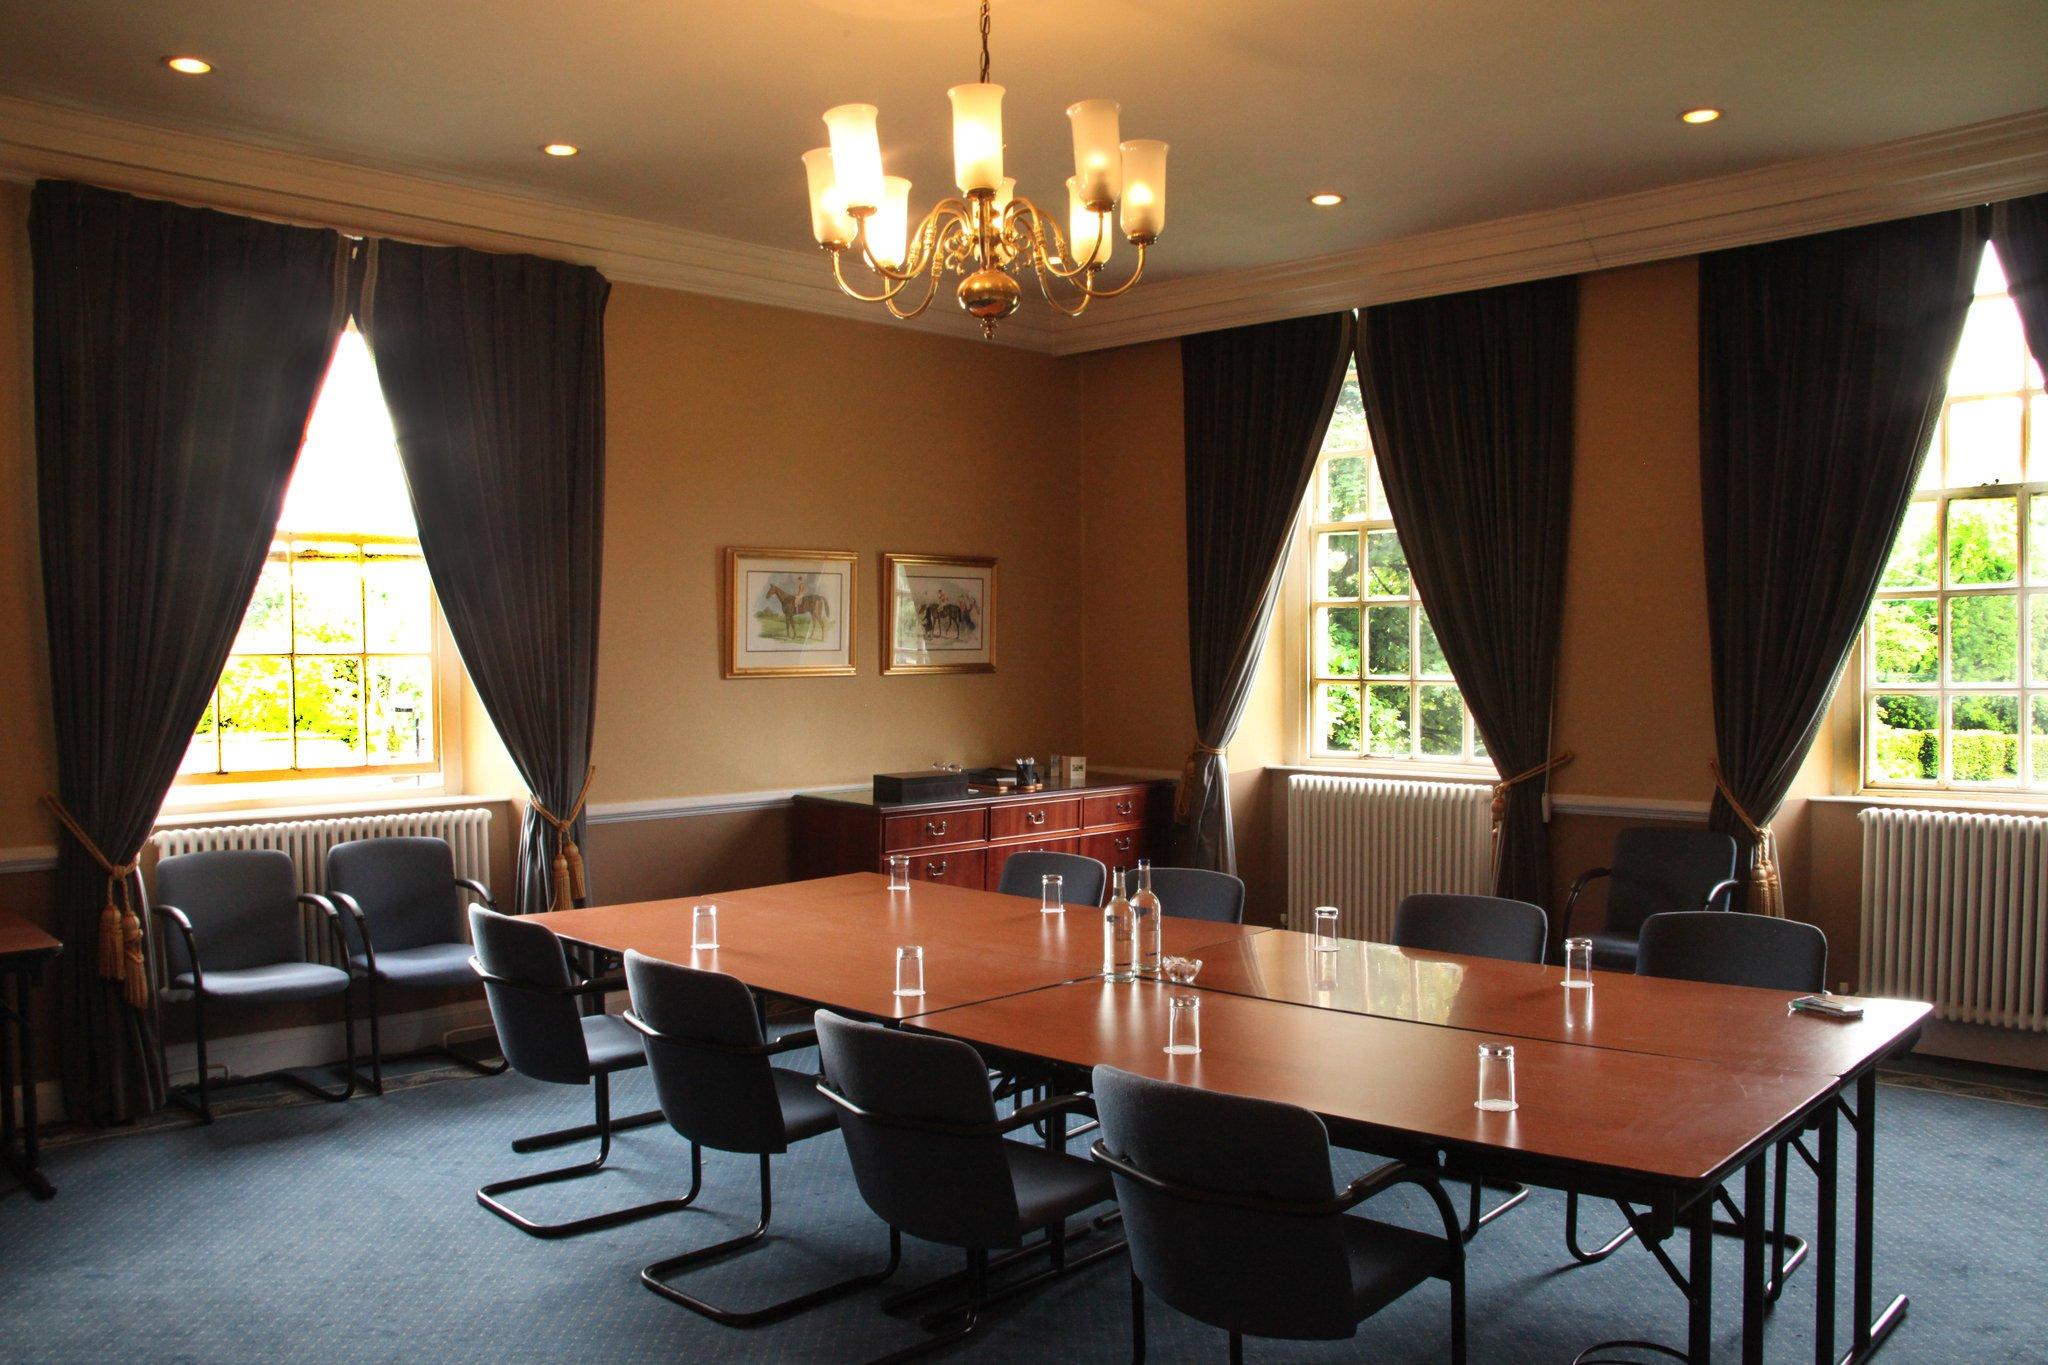 Holiday Inn Doncaster A1(M), Jct. 36